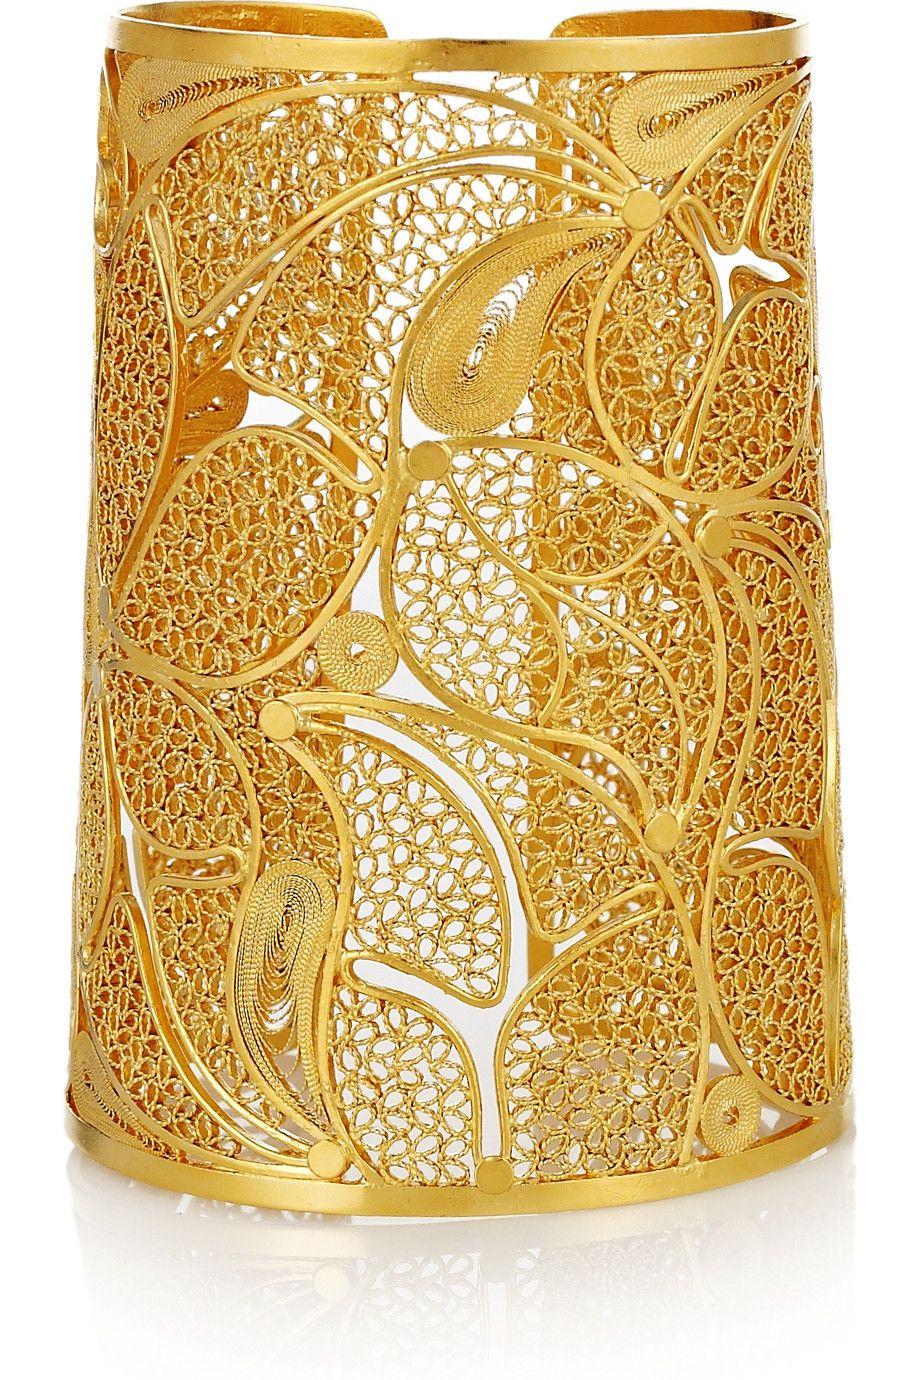 Mallarino Cielo 24karat goldvermeil filigree cuff shine bright